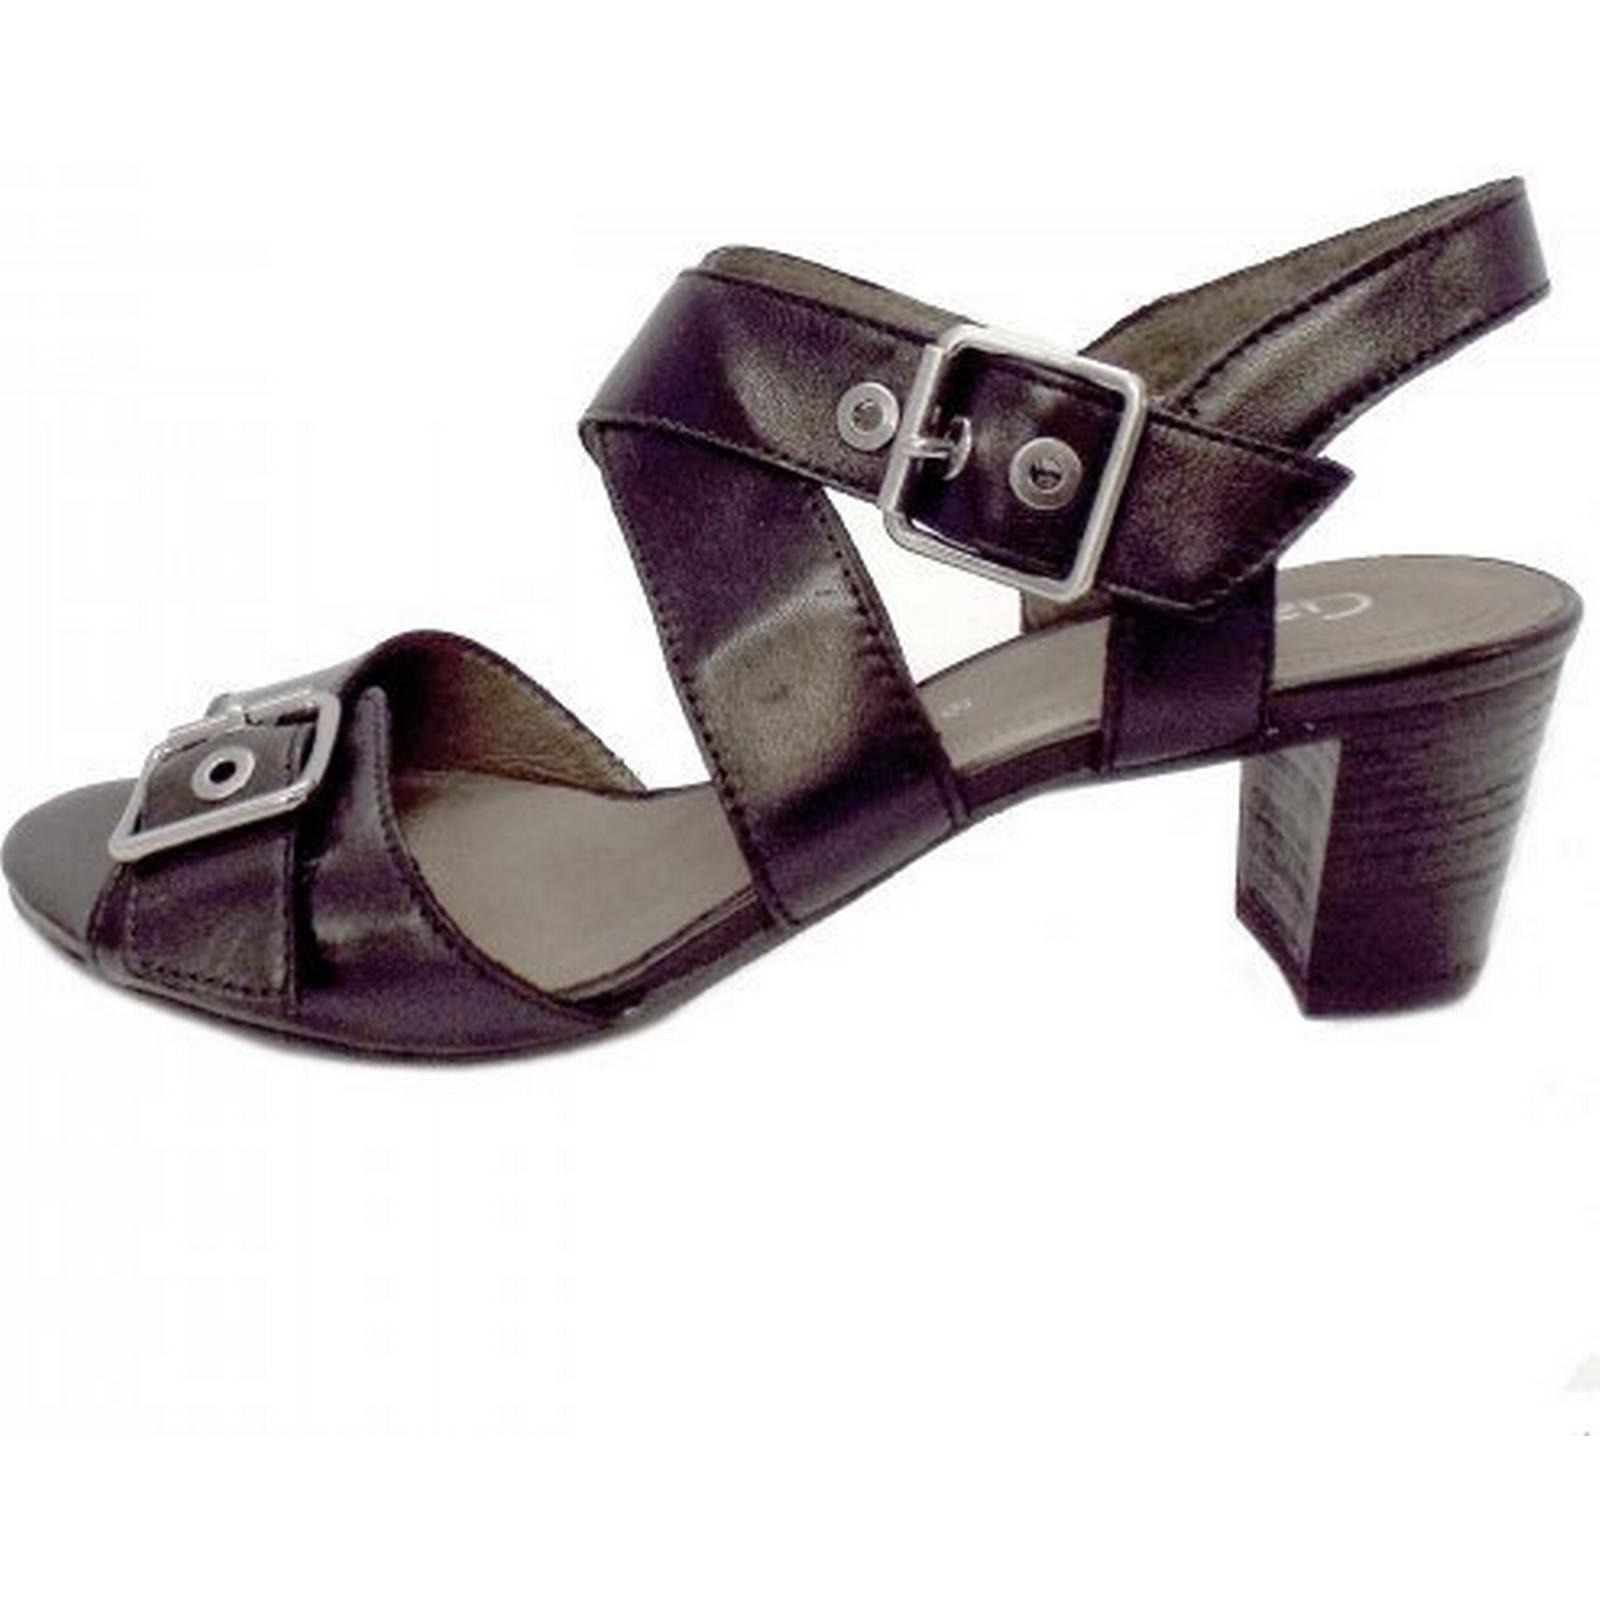 Gabor Britney Britney Gabor High Heel Sandal in Black Leather Size: 8, Colour: BLACK fbc96b